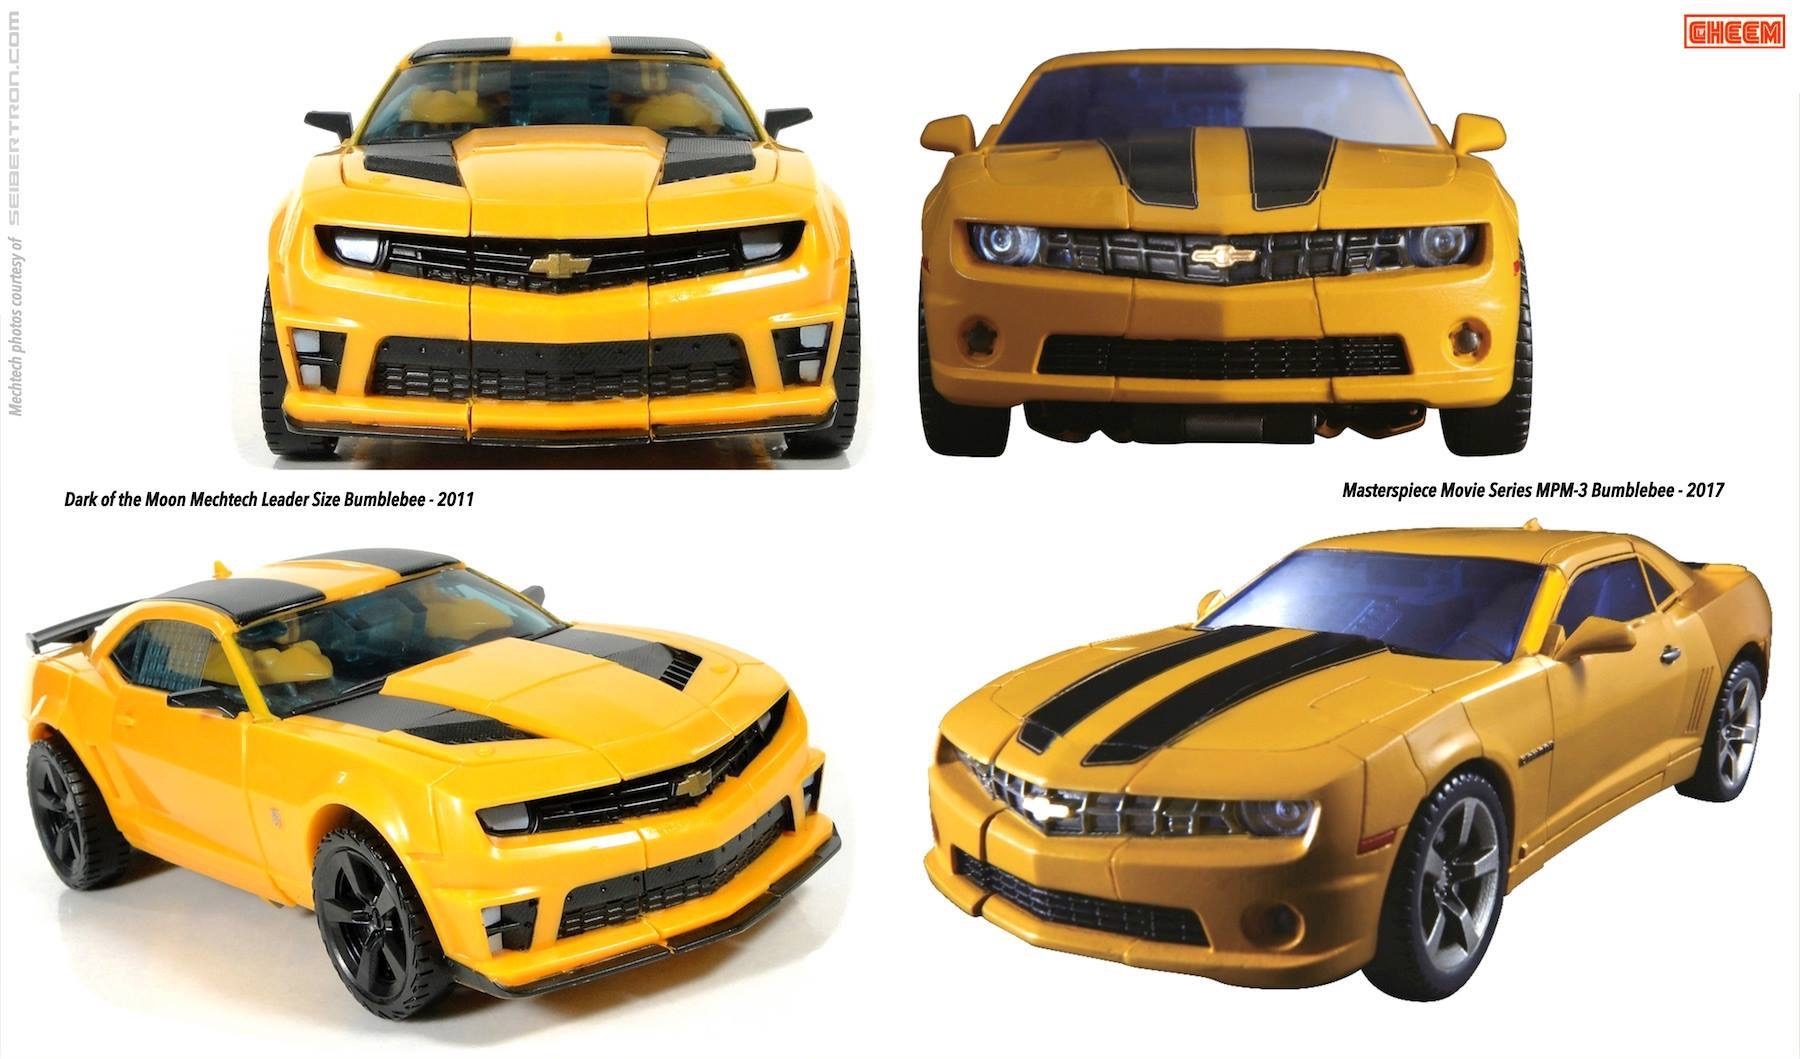 MPM3-masterpiece-movie-bumblebee-comparison-vehicle-car